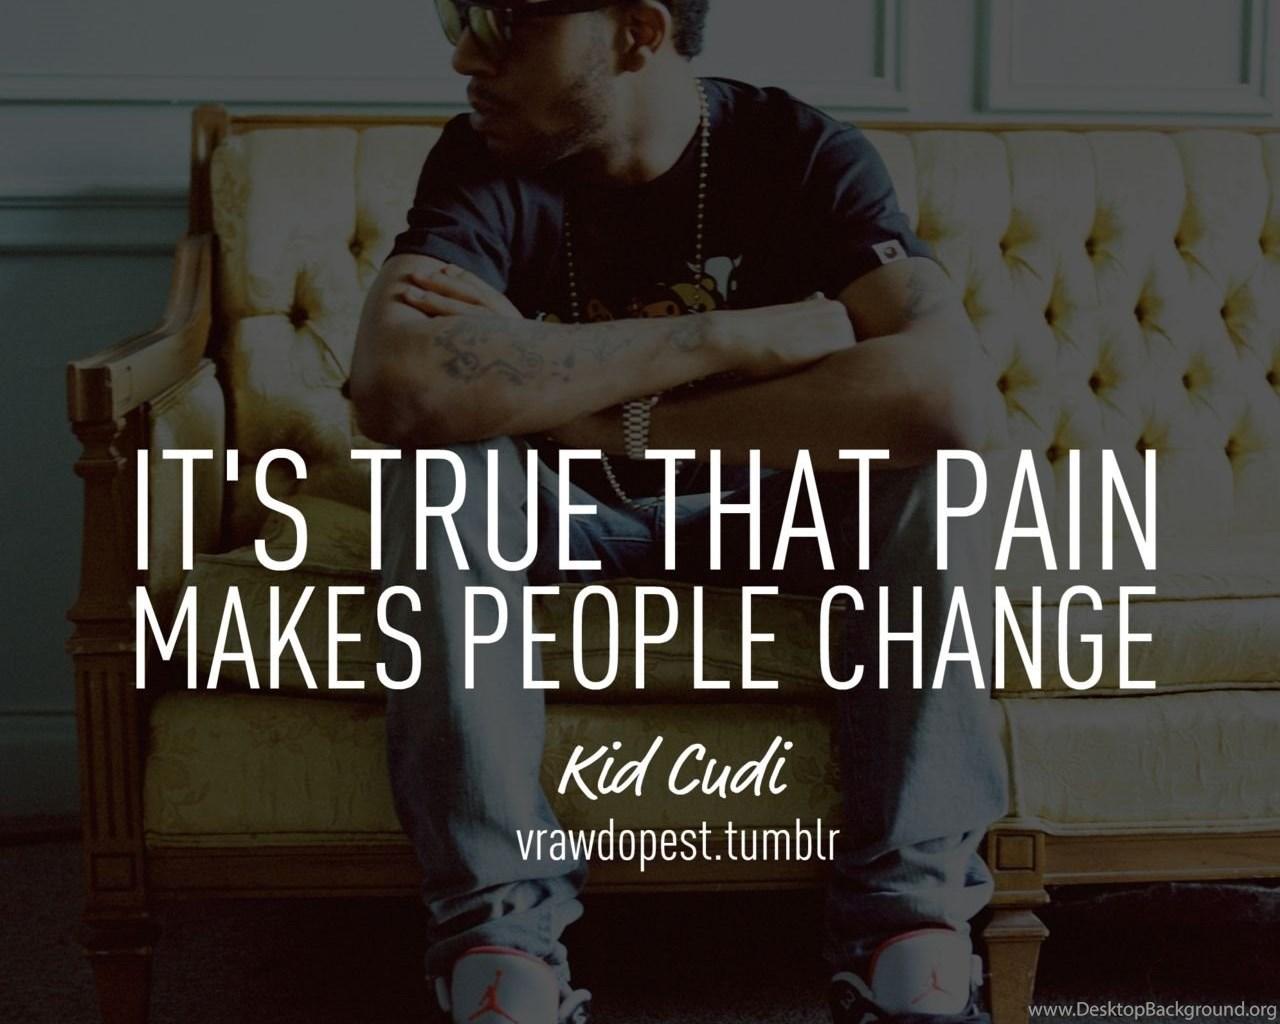 Kid Cudi Quotes Tumblr Cool Sojis Wallpapers Desktop Background